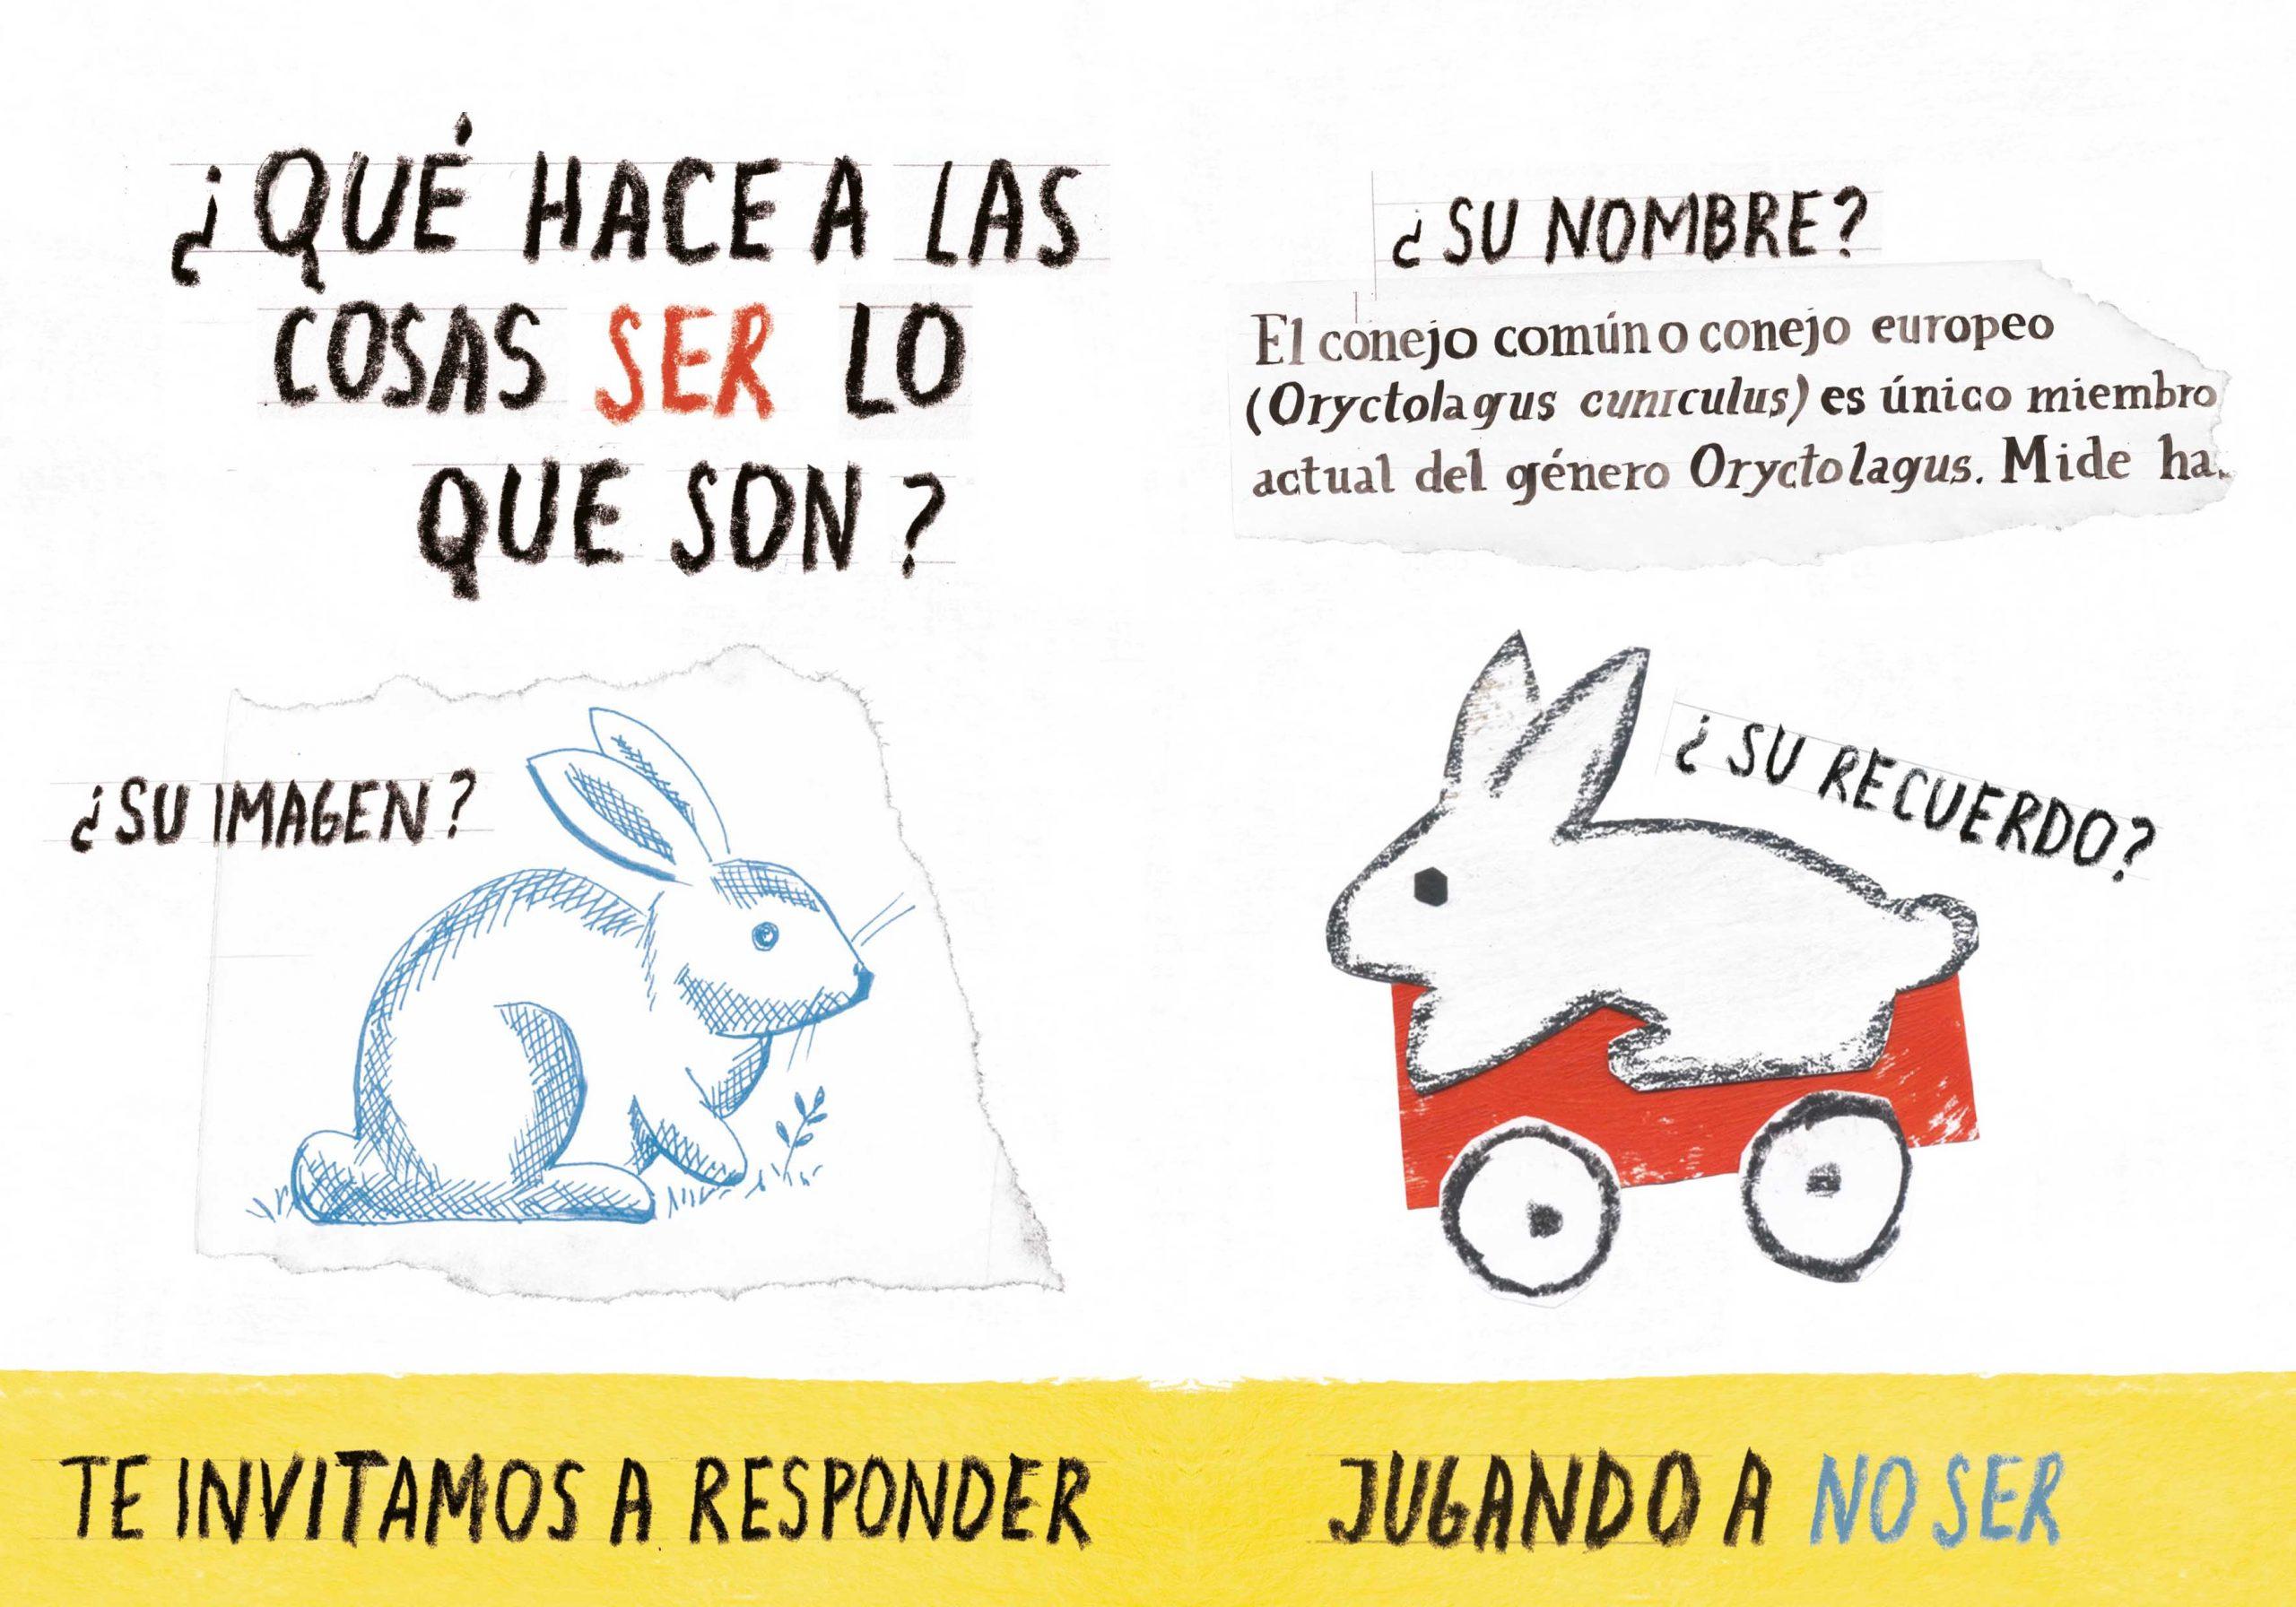 22_MANERAS DE NO SER.indd